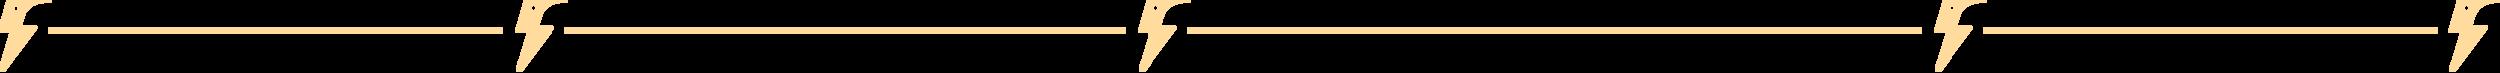 cream_HSS-Bar_servicemodel1.png